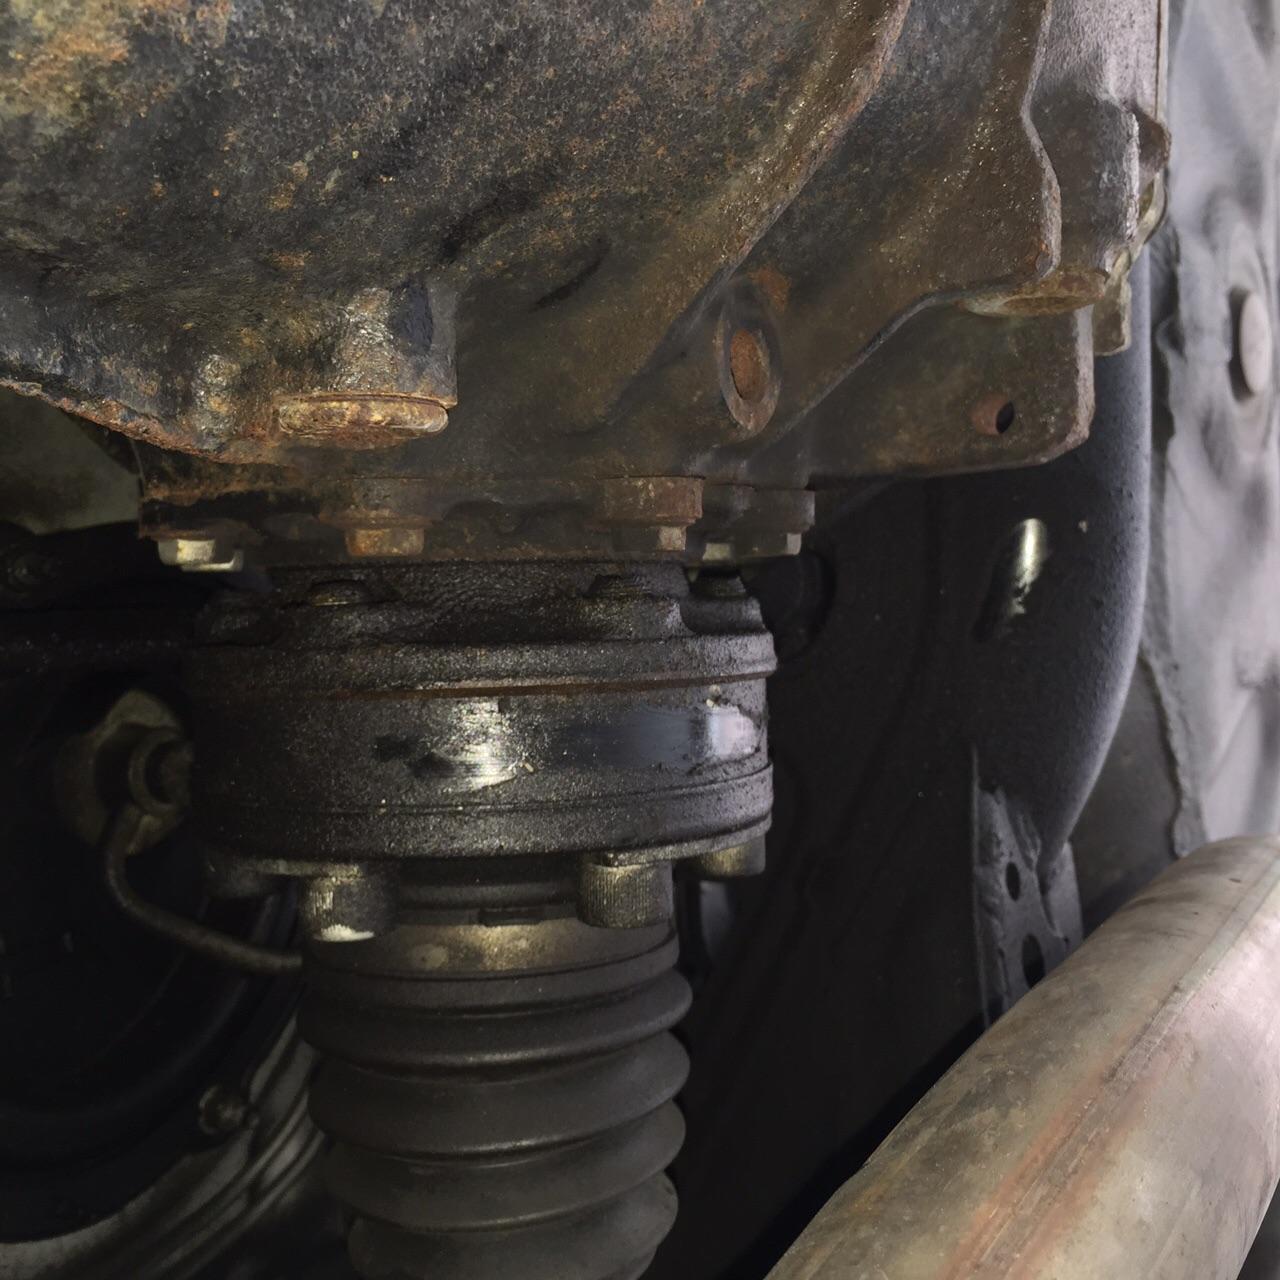 hight resolution of passenger side differential leak image jpg